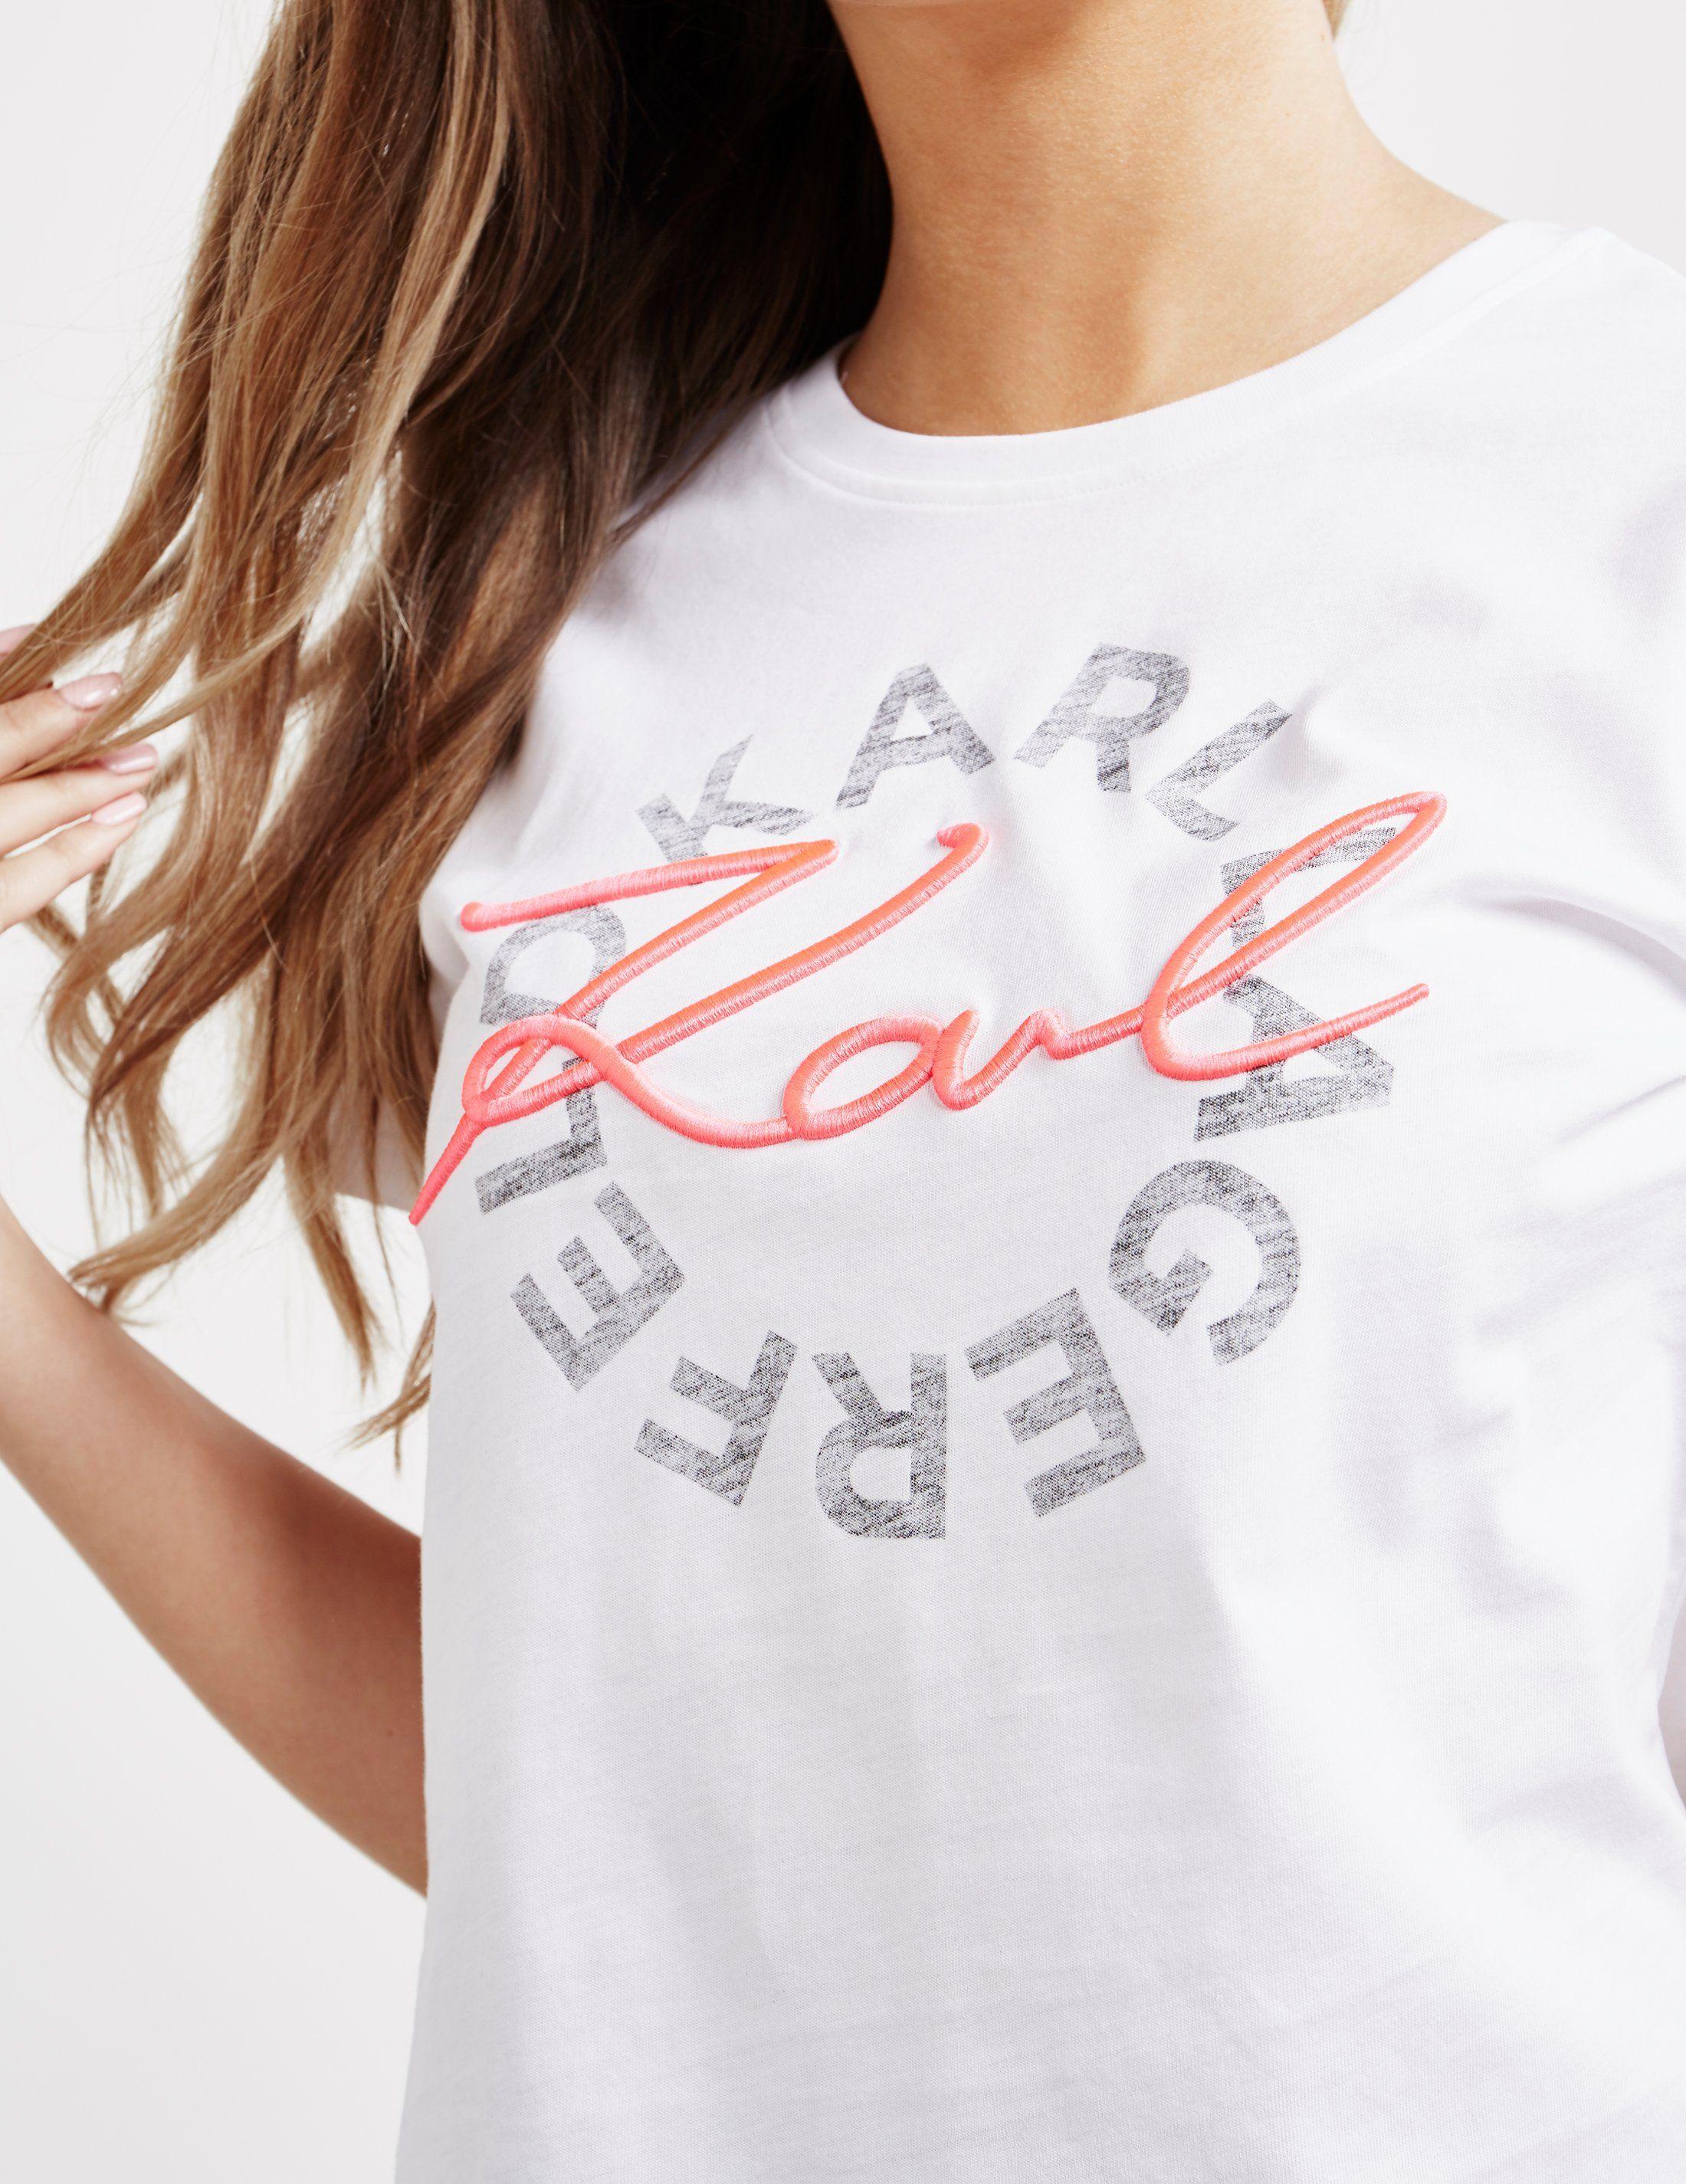 Karl Lagerfeld Neon Logo Short Sleeve T-Shirt